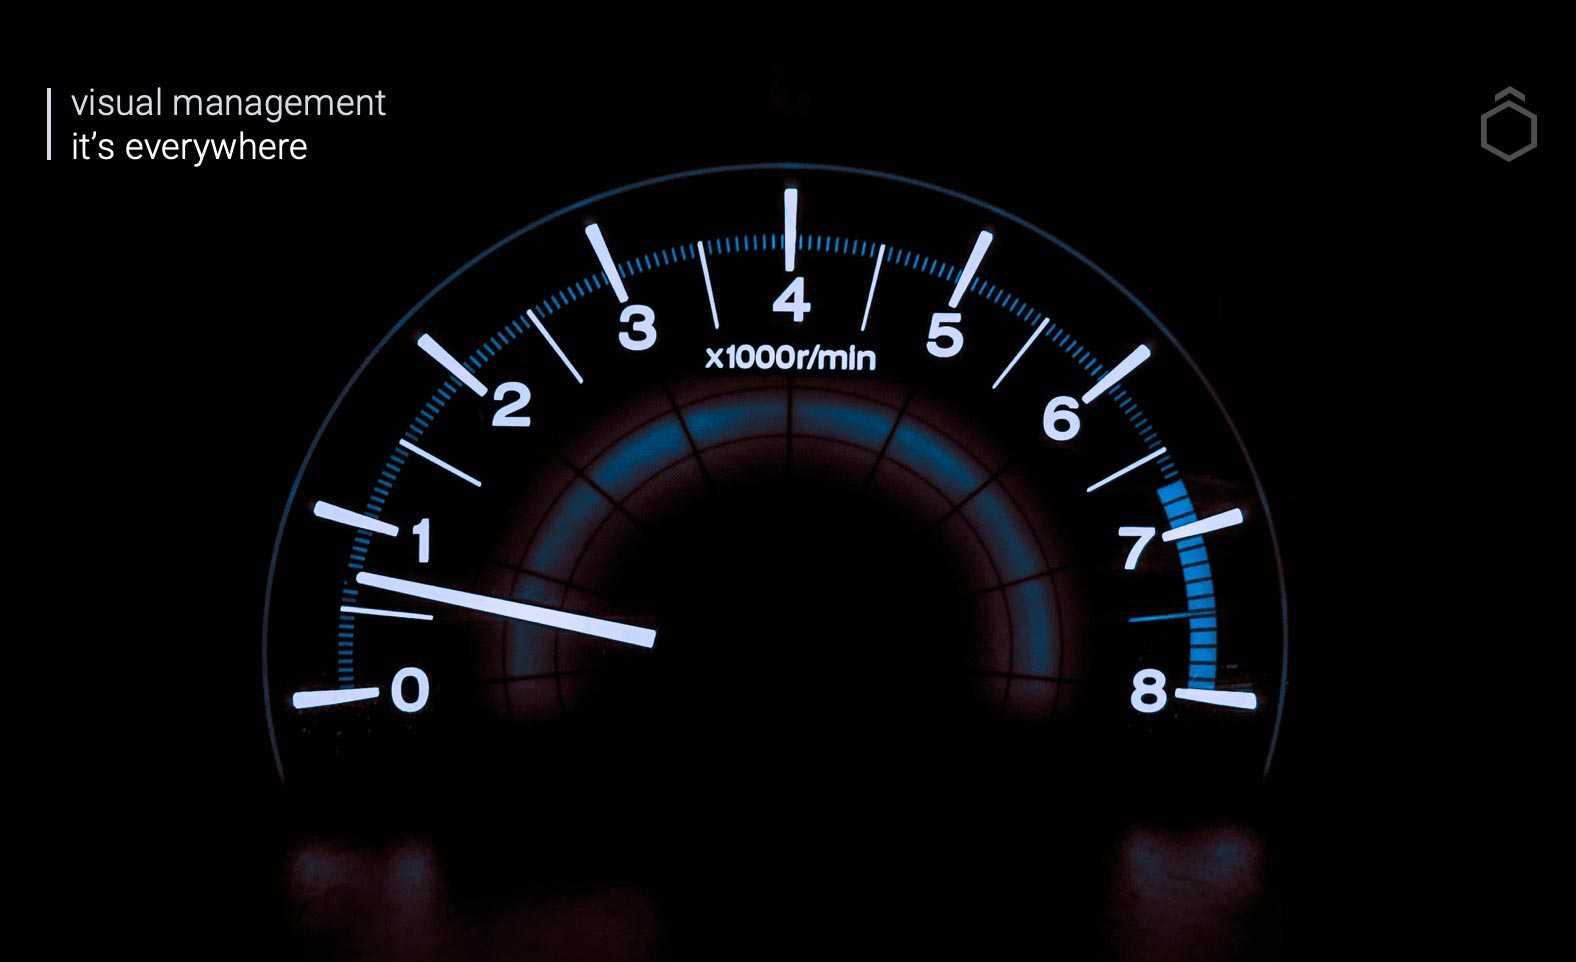 Dashboard on Vehicle - Visual Mangaement